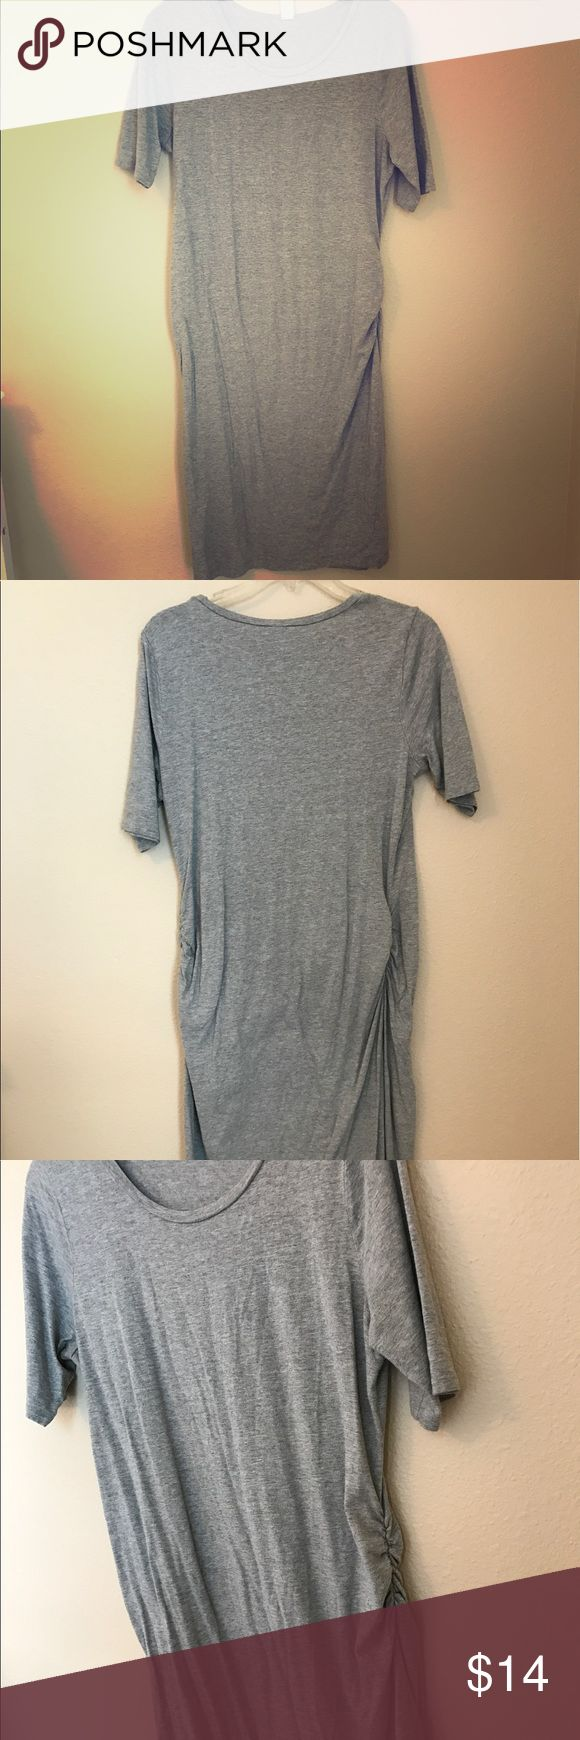 Old Navy Maternity Dress Heather Grey Maternity Dress. SUPER COMFY! Old Navy Dresses Midi